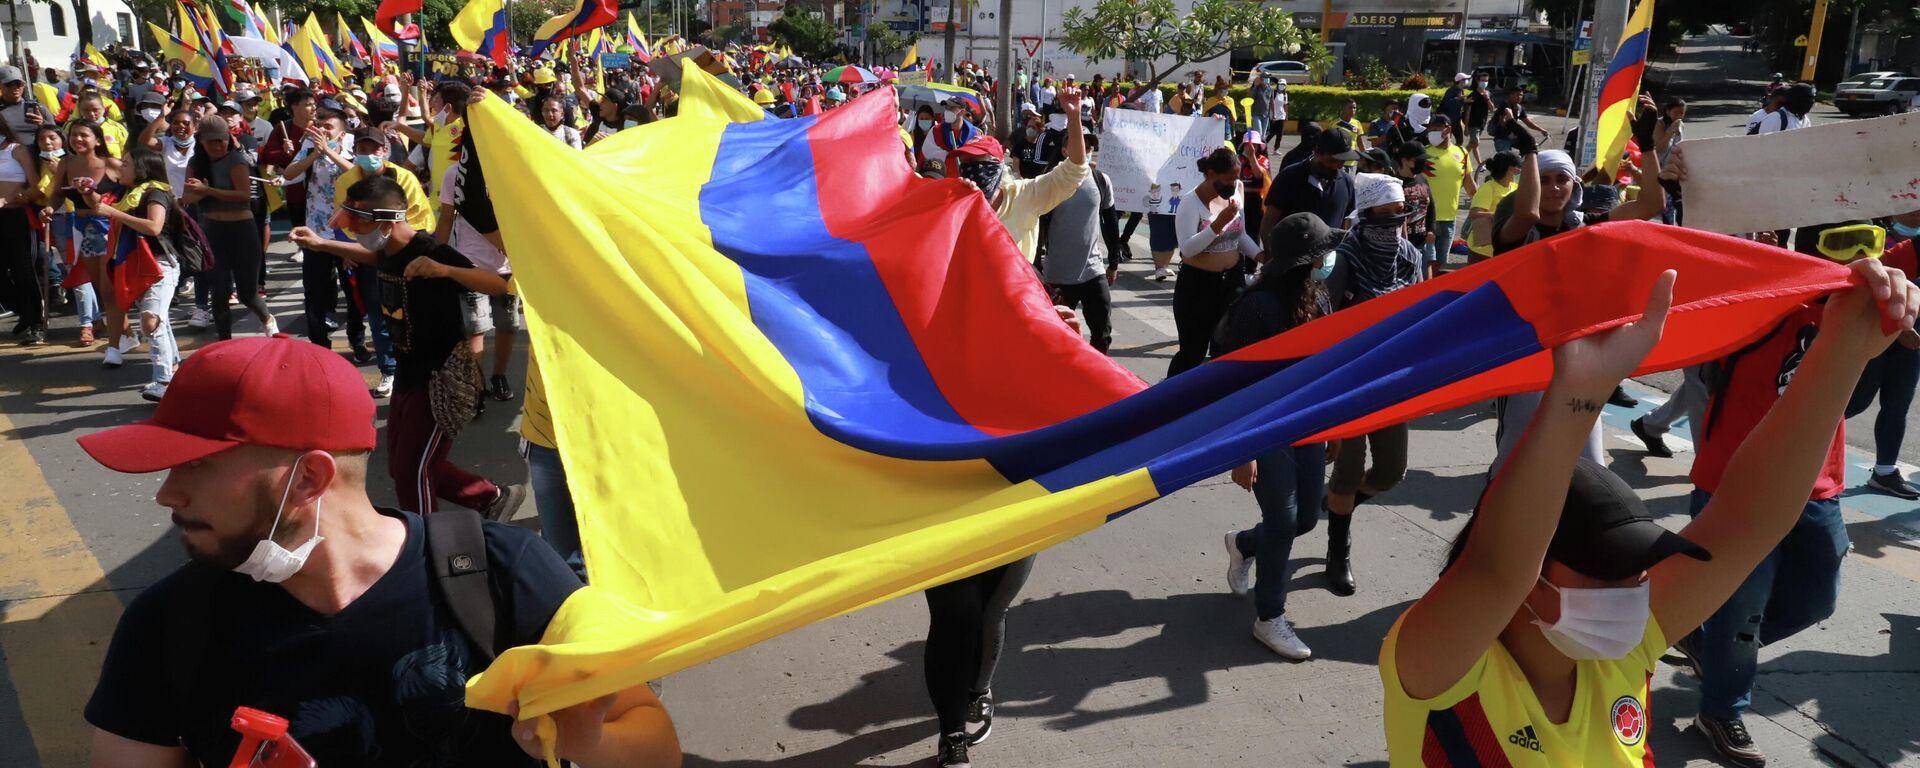 Protestas en Cali, Colombia - Sputnik Mundo, 1920, 20.05.2021